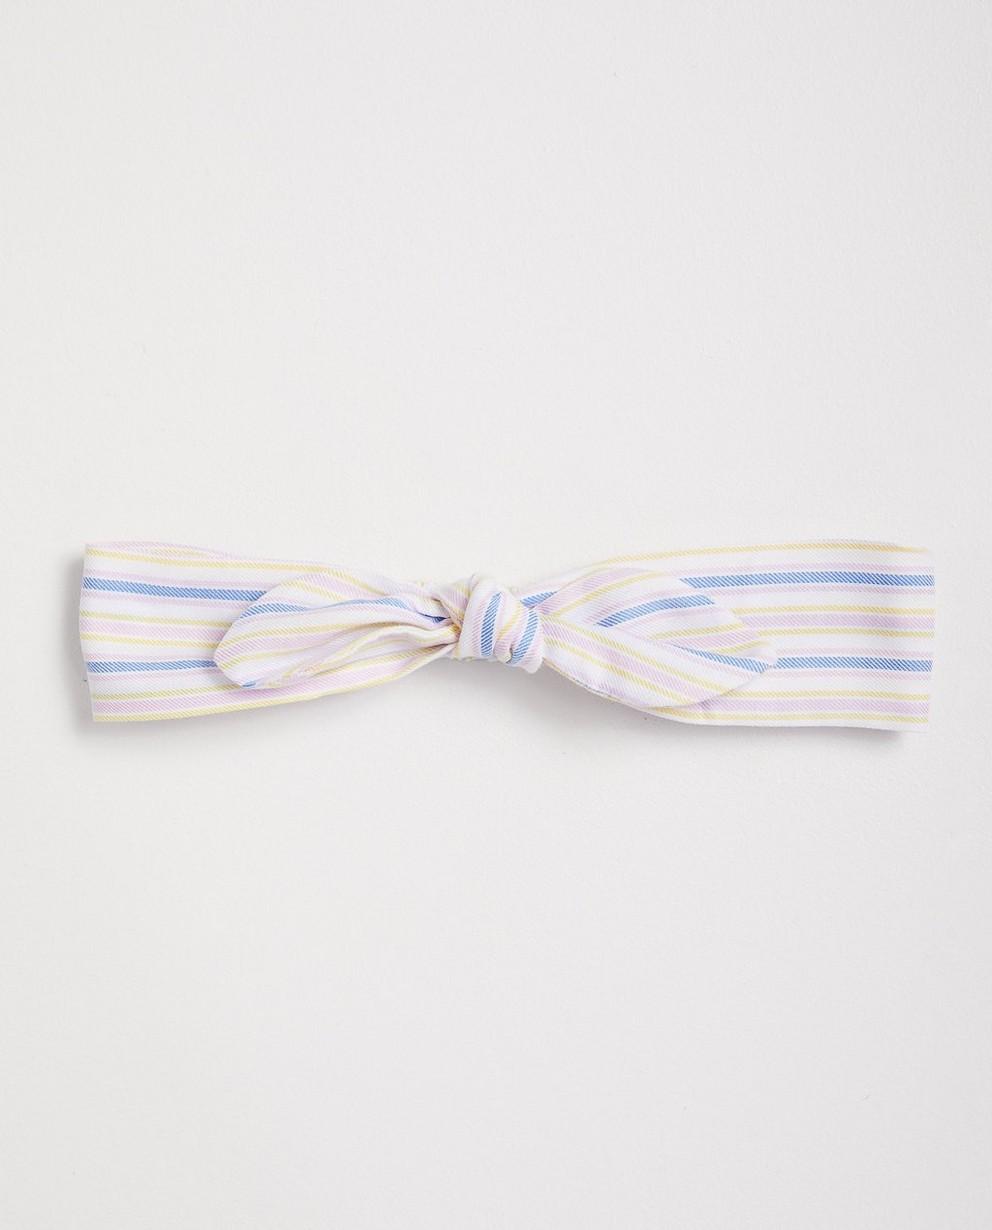 Bandeau rayé Maya - blanc - jaune - rose - bleu - JBC